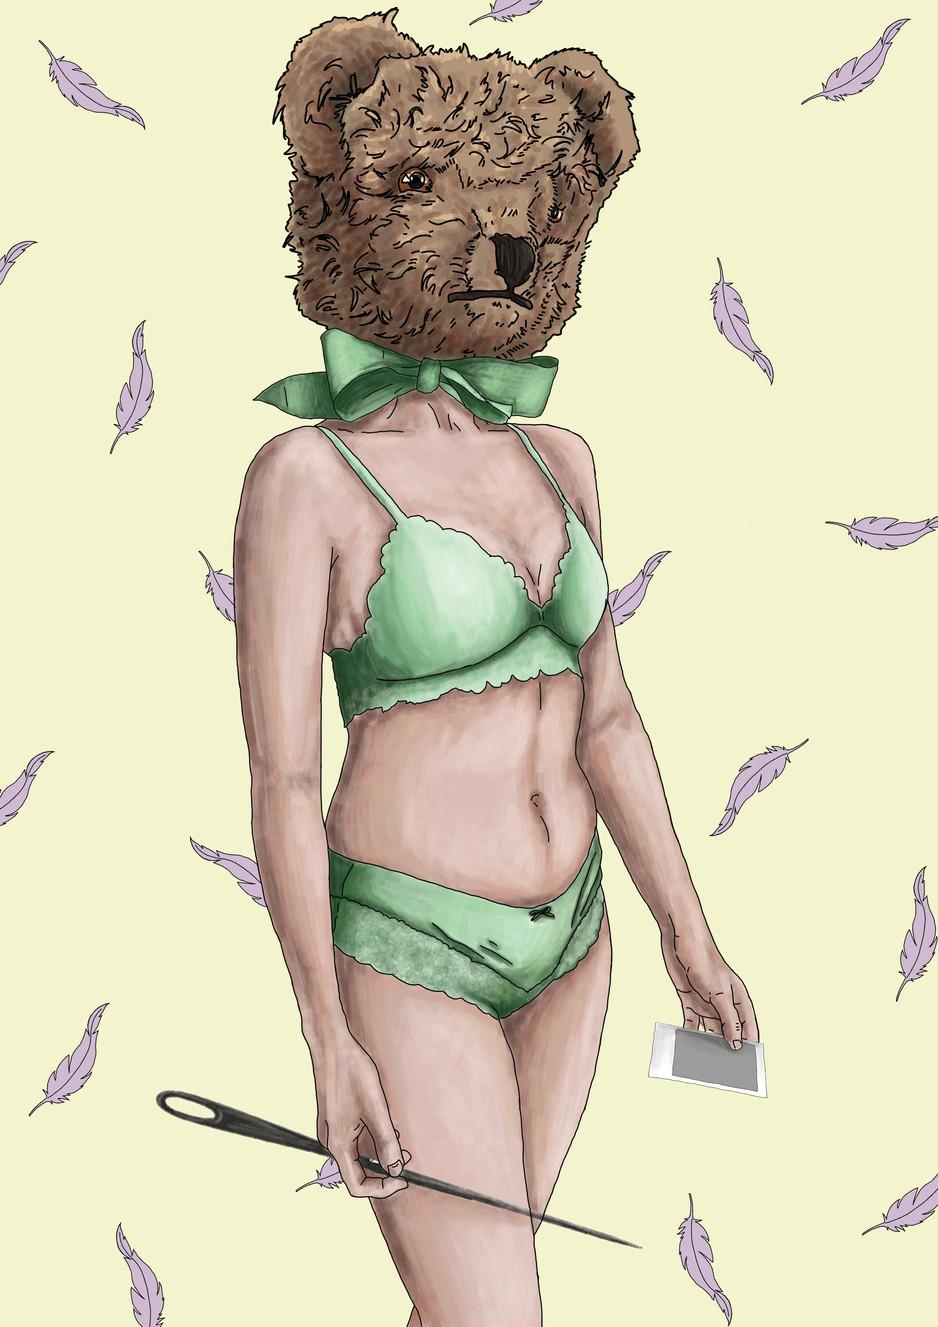 Teddy Bear Digital Painting